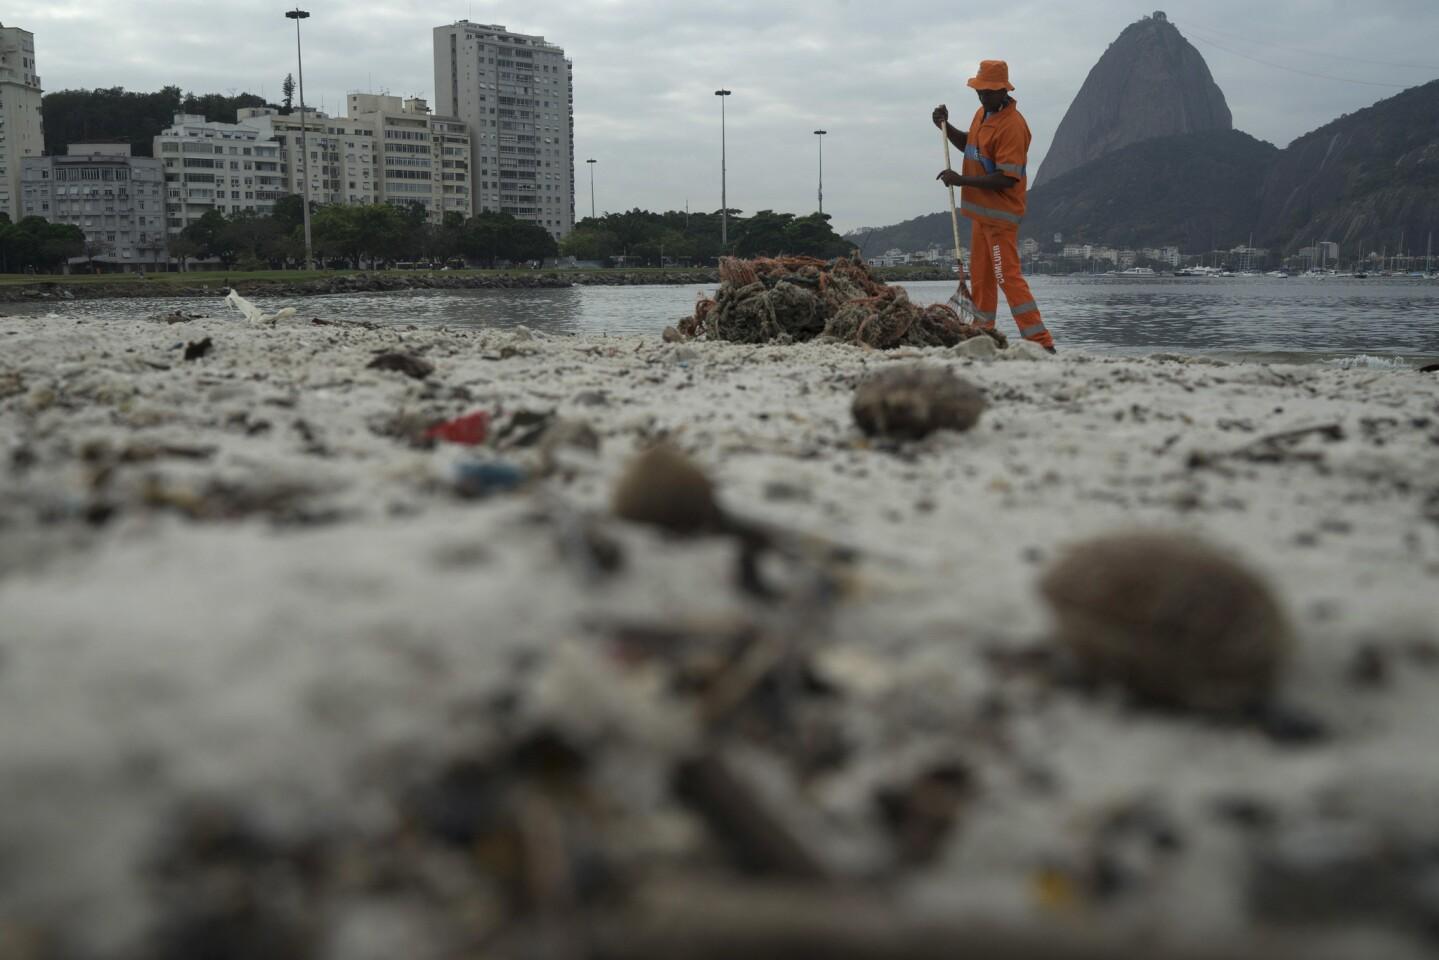 Pollution in Rio's Guanabara Bay